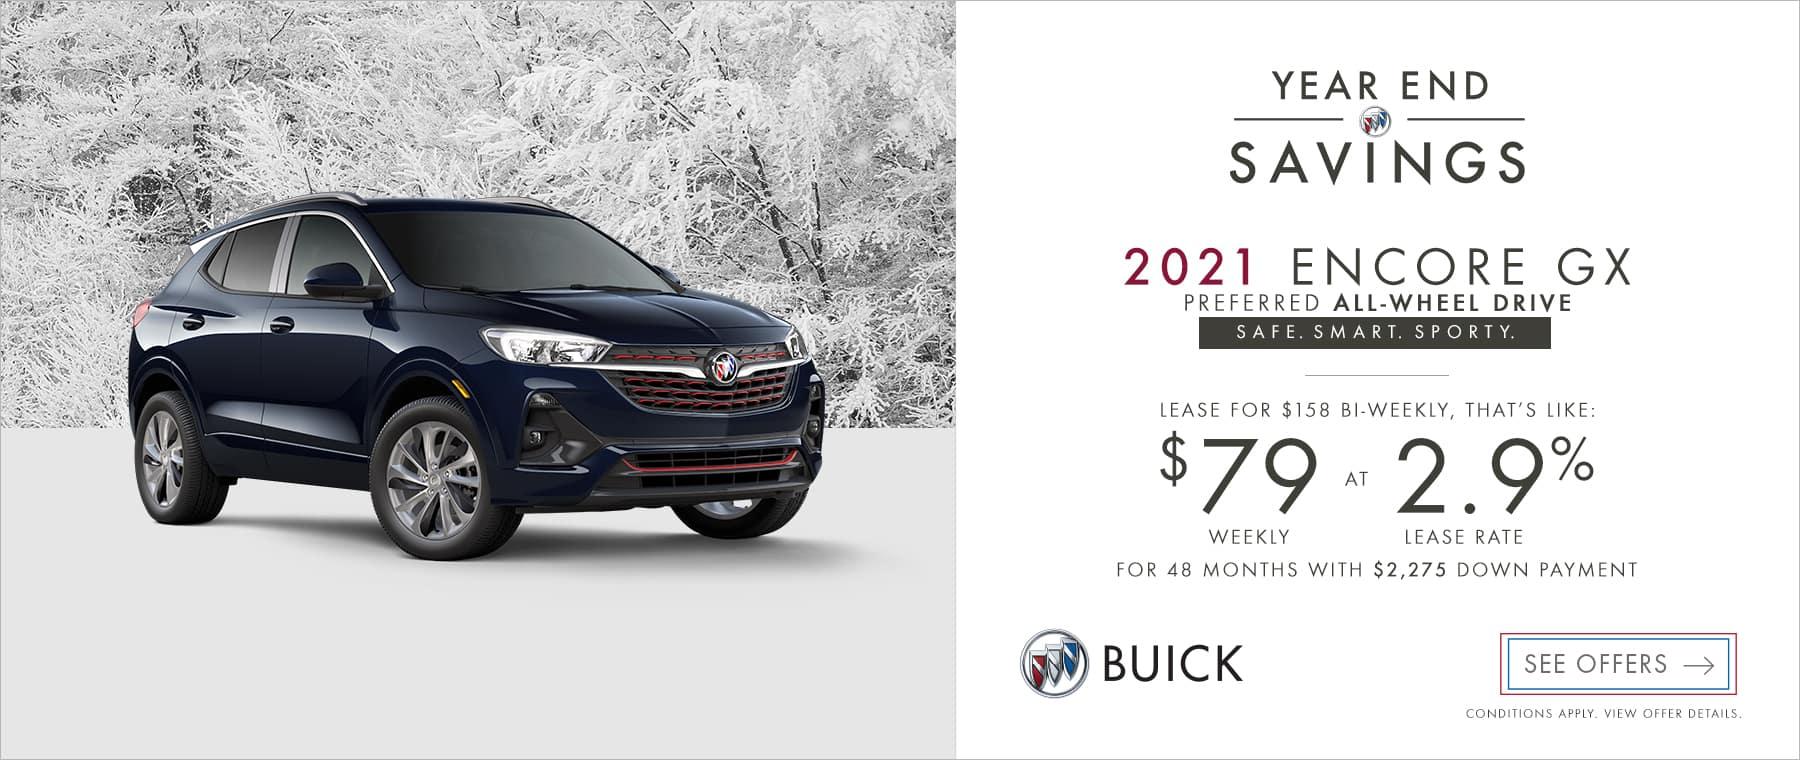 2020_DEC_CNT_Buick_T3_1800X760_MULTI